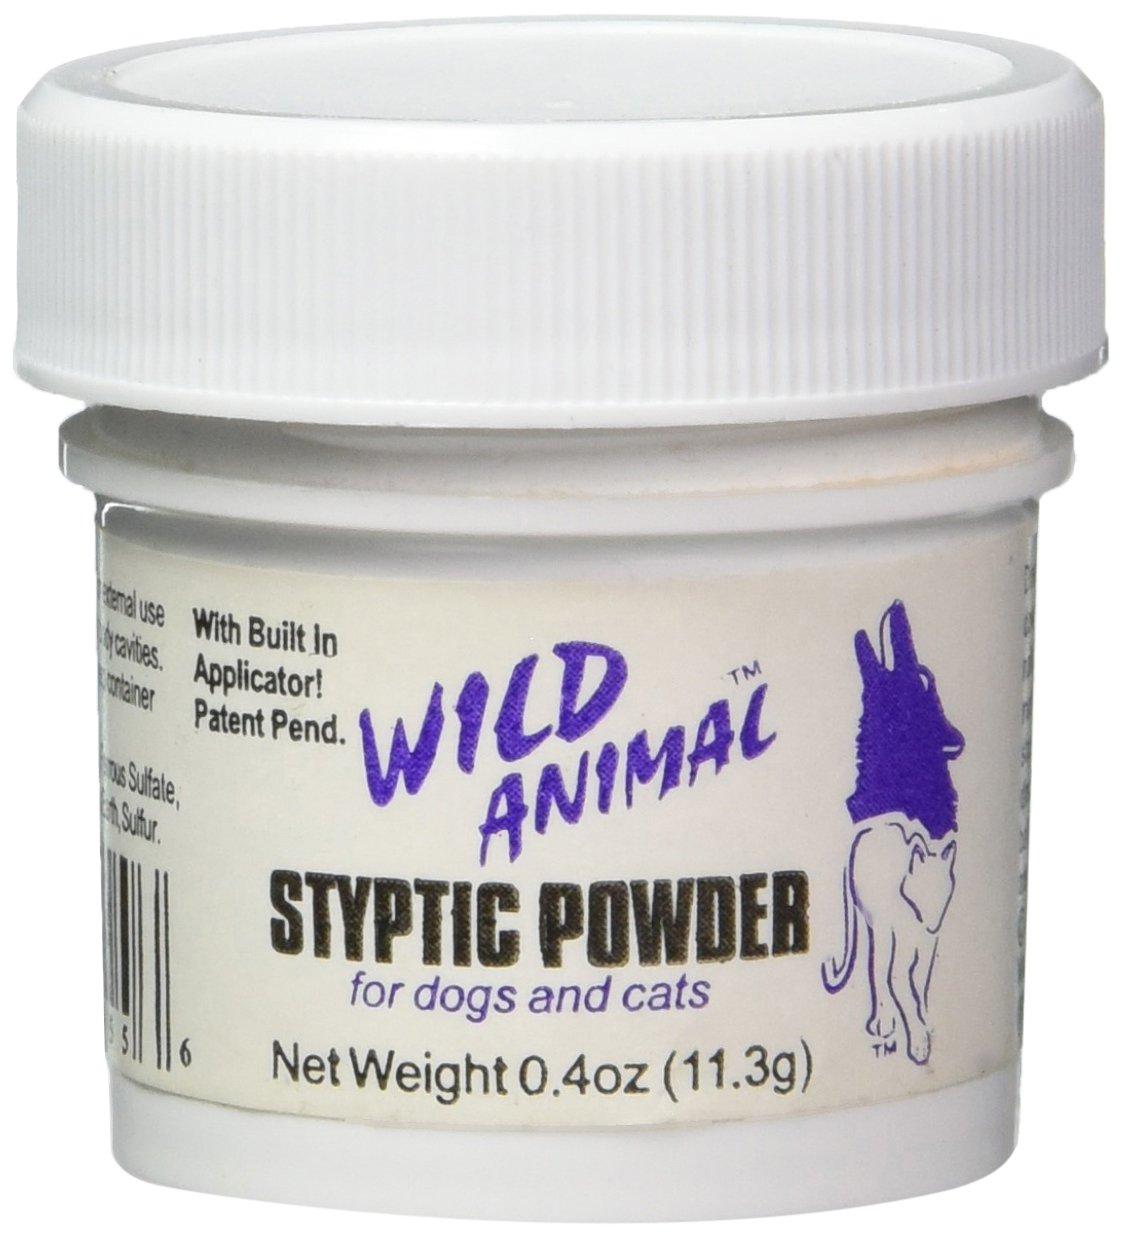 Wild Animal Styptic Powder by Wild Animal